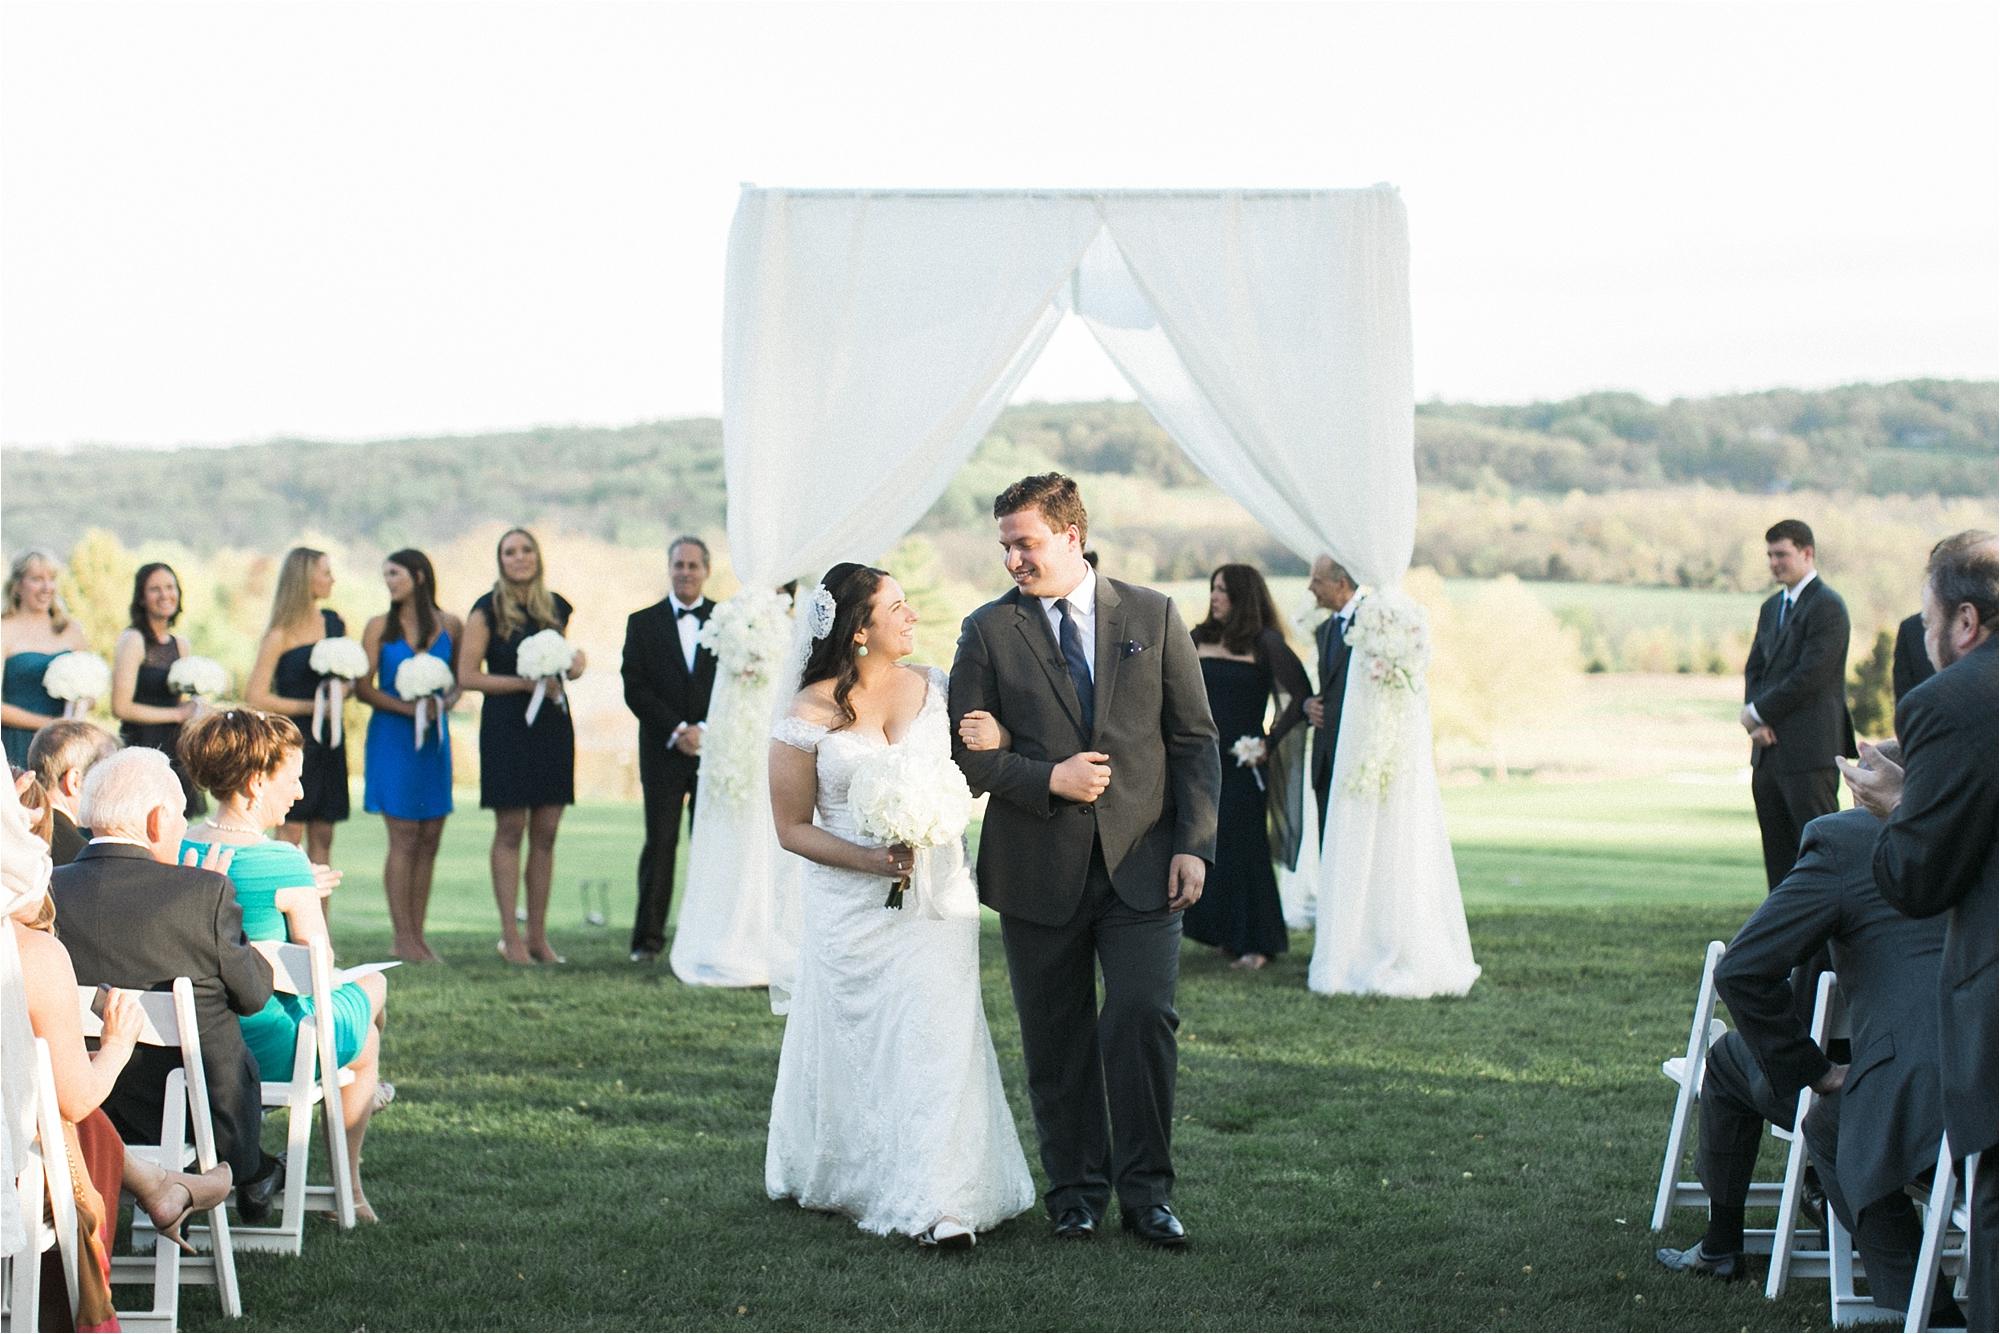 tom-jill-baltimore-maryland-industrial-elegant-wedding-035.JPG